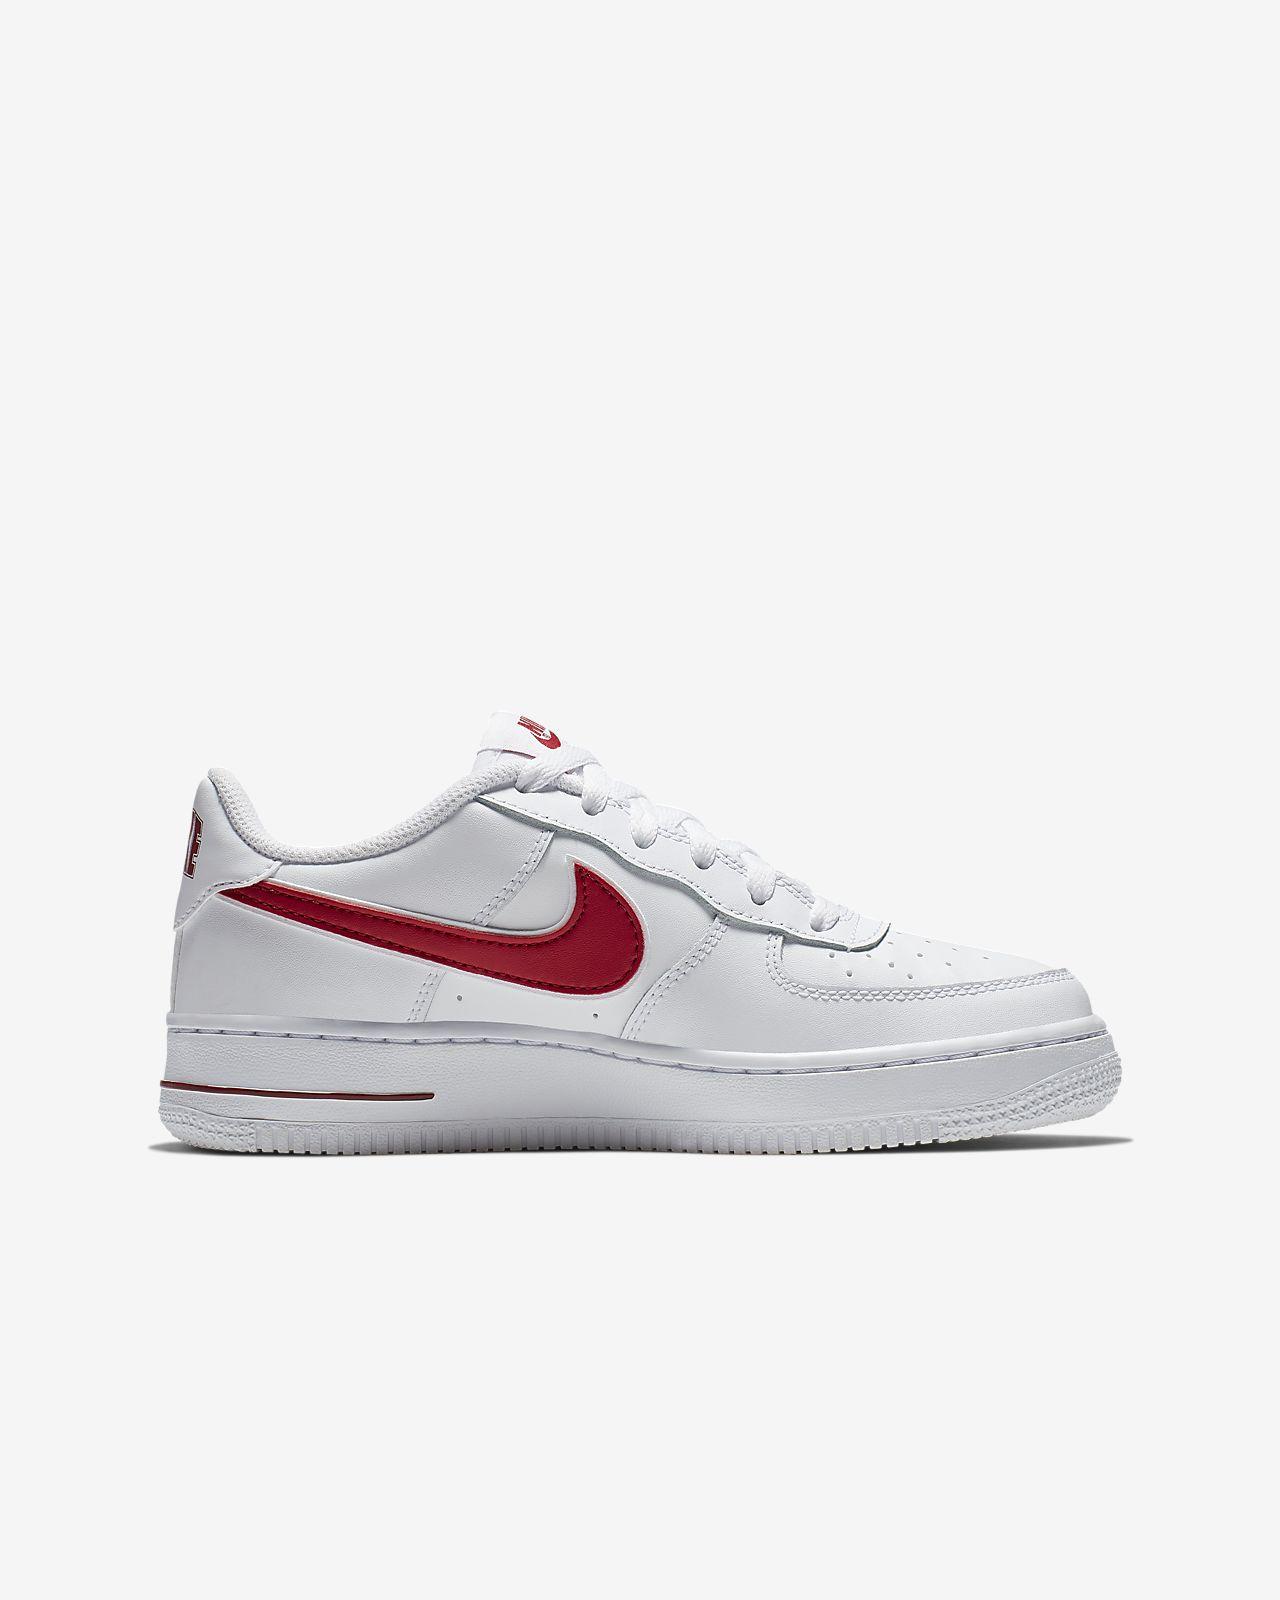 size 40 89fc3 98f63 ... Nike Air Force 1-3 Schuh für ältere Kinder